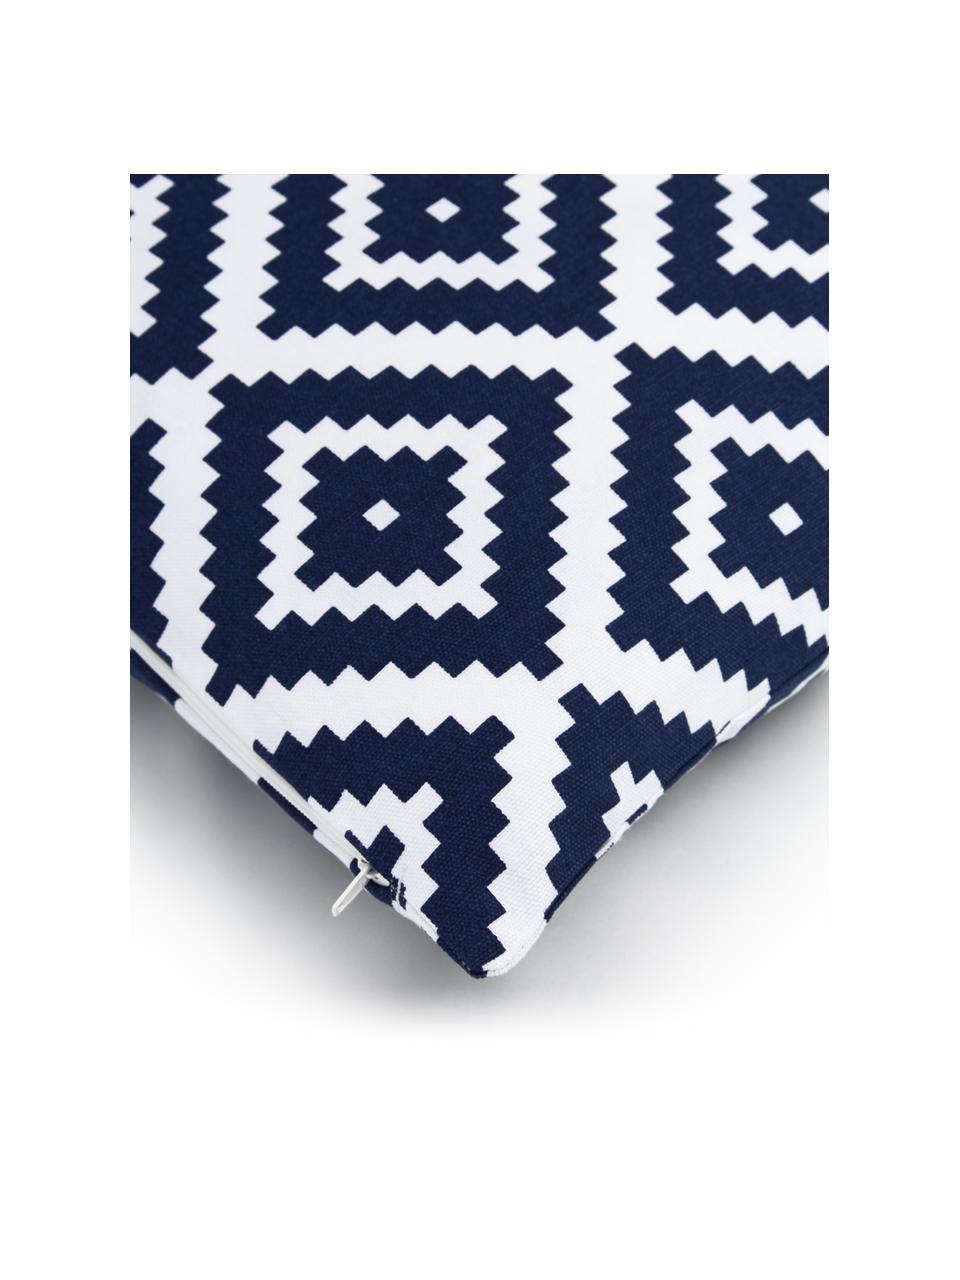 Kussenhoes Miami in donkerblauw/wit, 100% katoen, Blauw, 45 x 45 cm